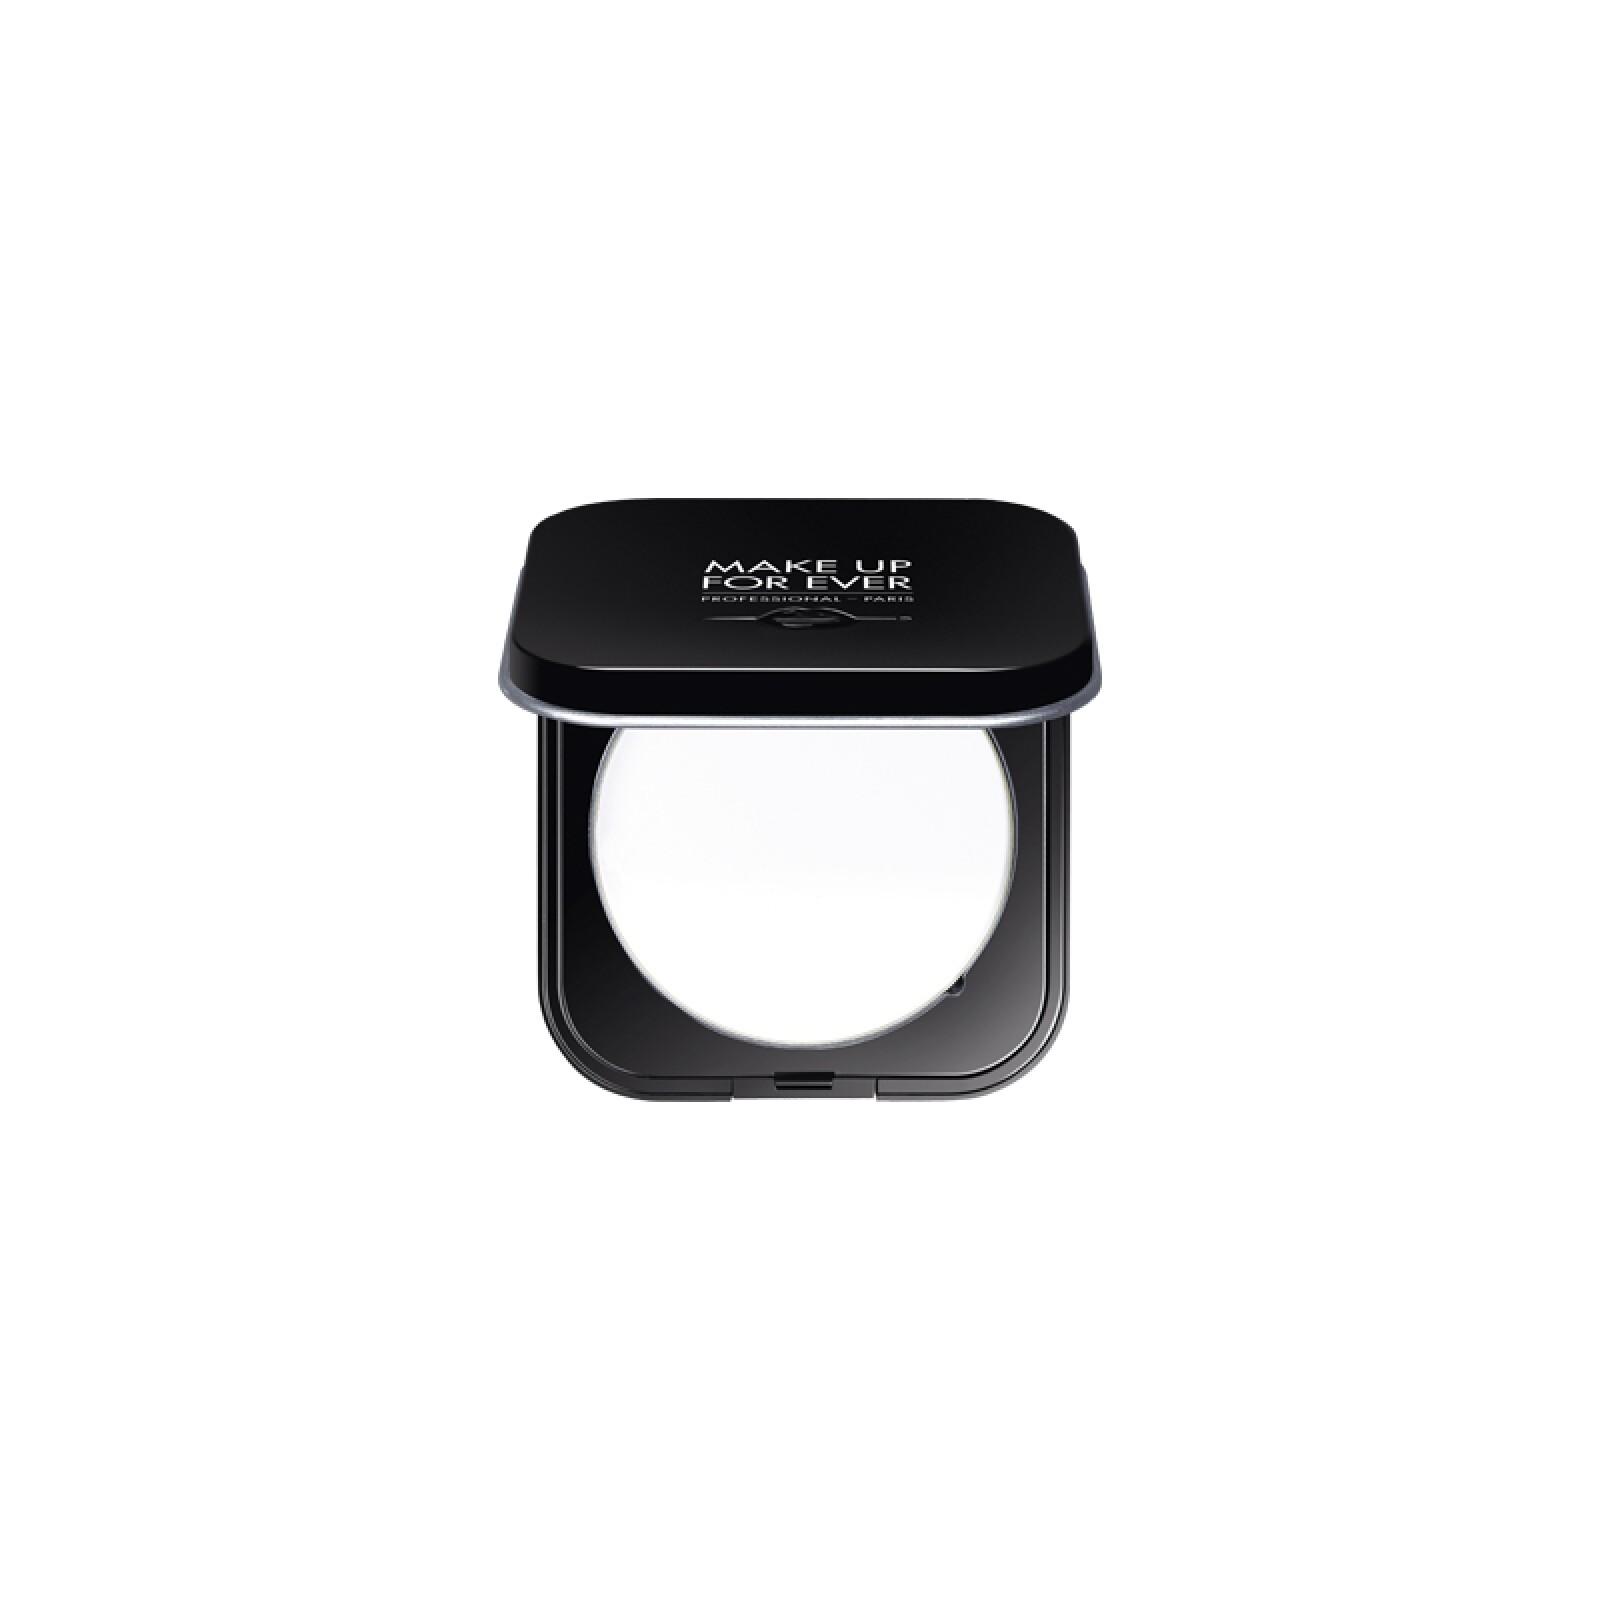 polvos-selladores-maquillaje-setting powder-baking-makeup-makeupforever